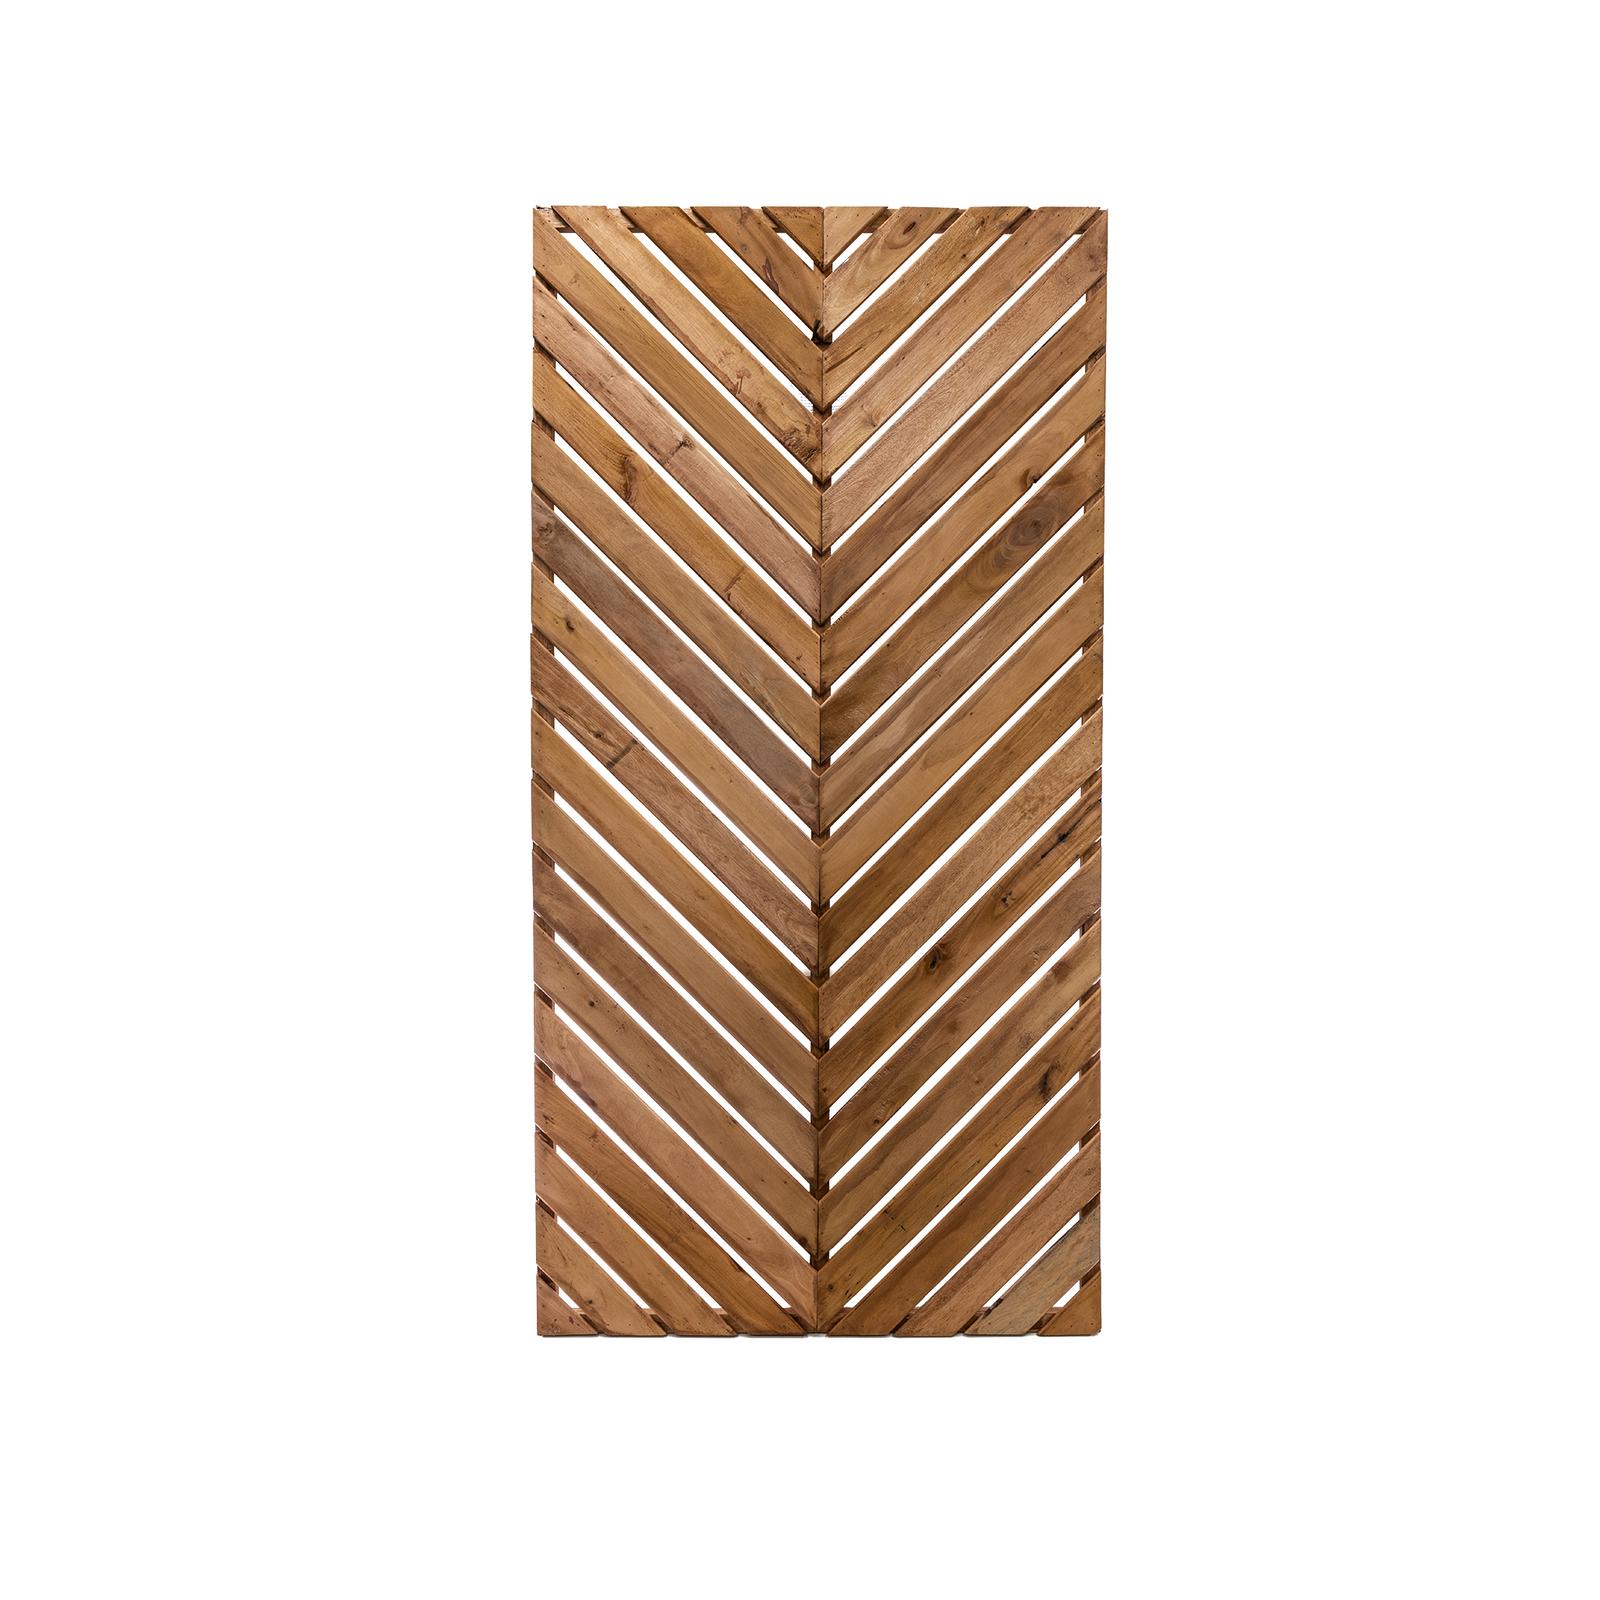 Lattice Makers 1800 x 900mm Herringbone Hardwood Screen Panel